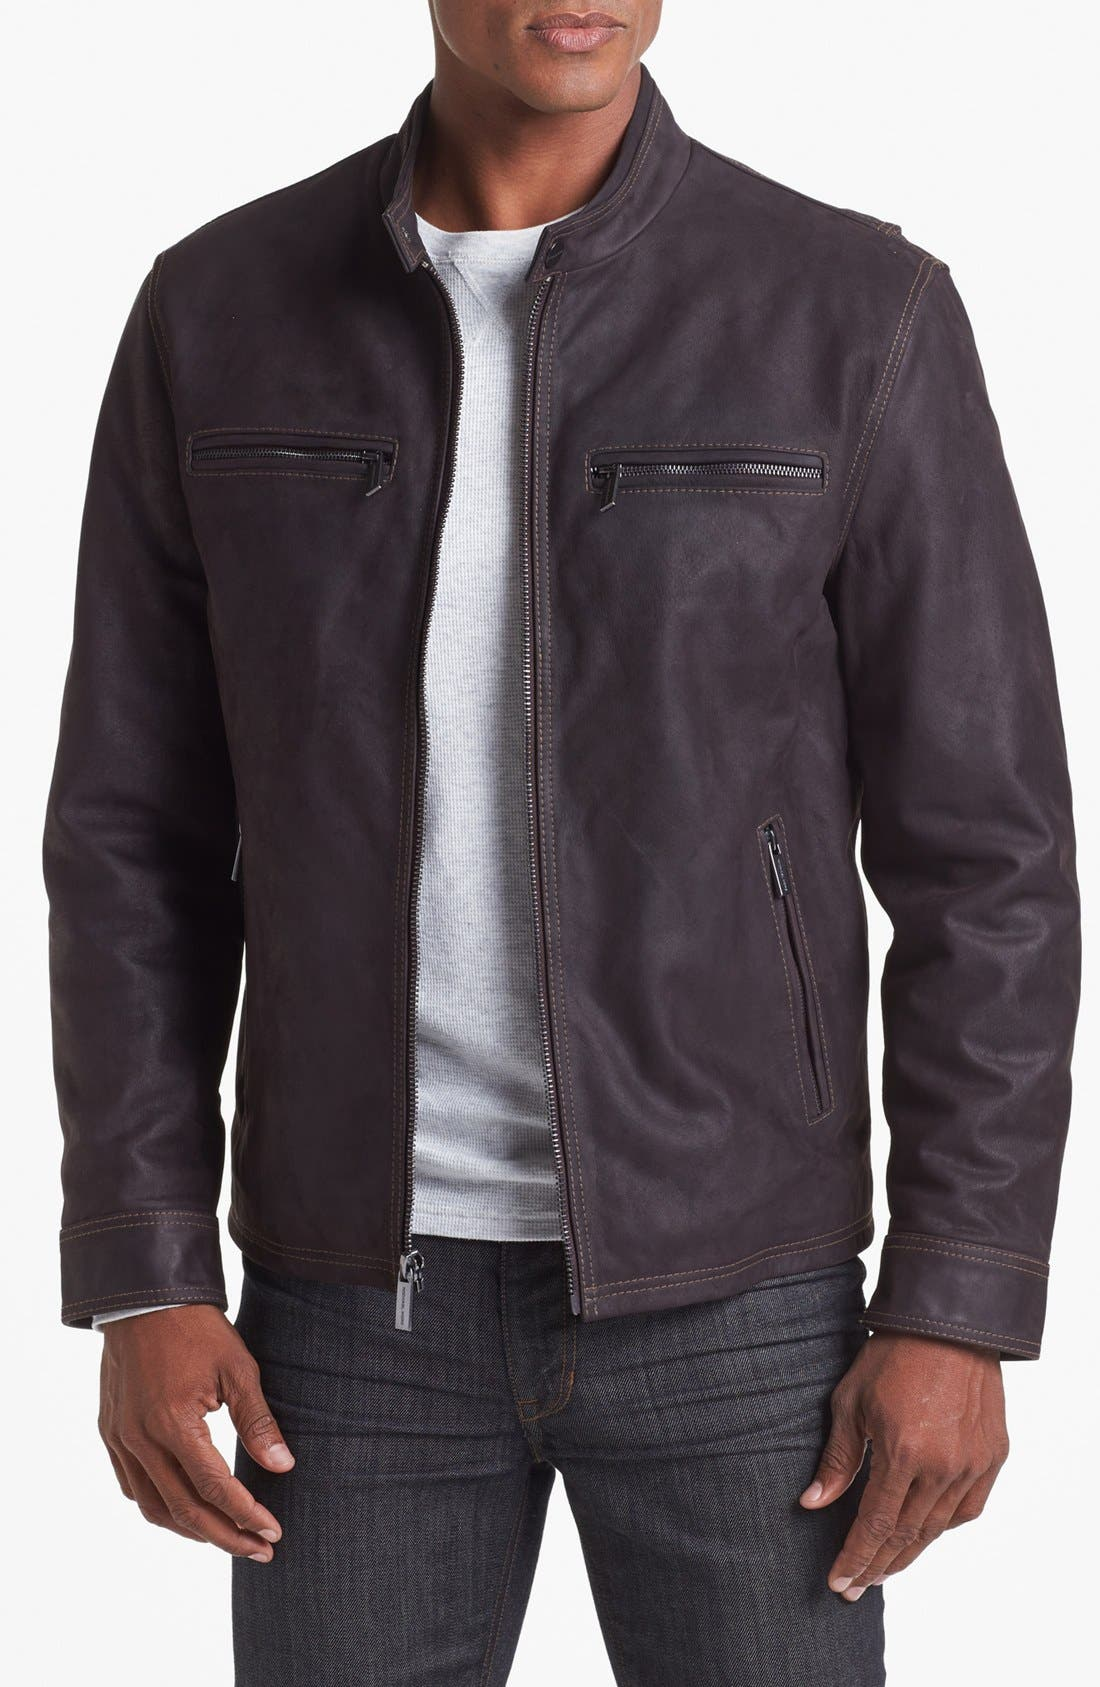 Main Image - Michael Kors 'Lodi' Jacket